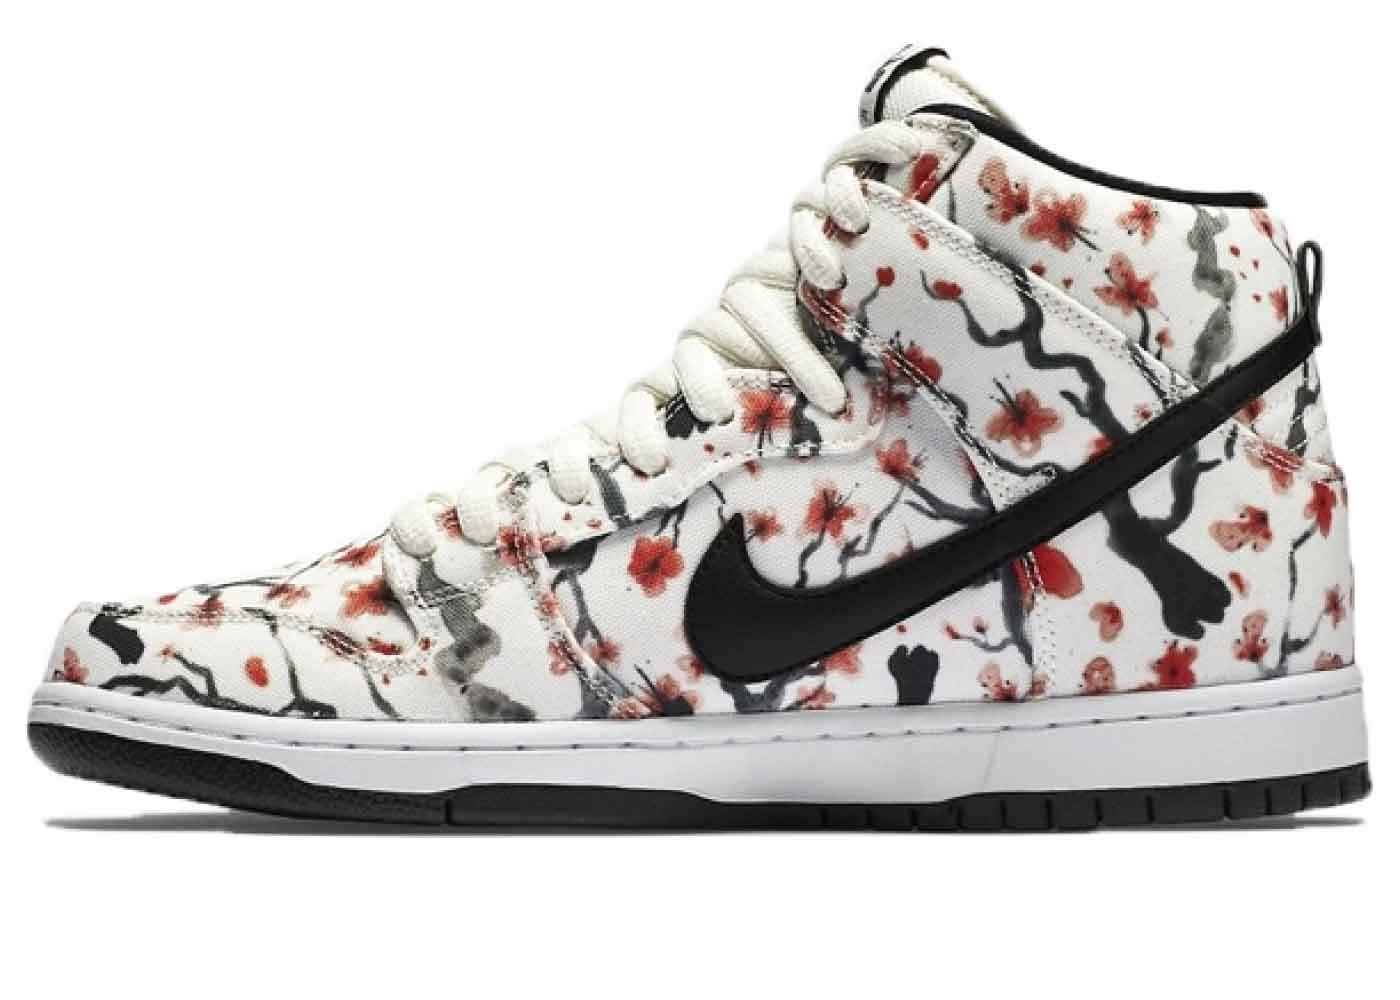 Nike SB Dunk High Cherry Blossomの写真